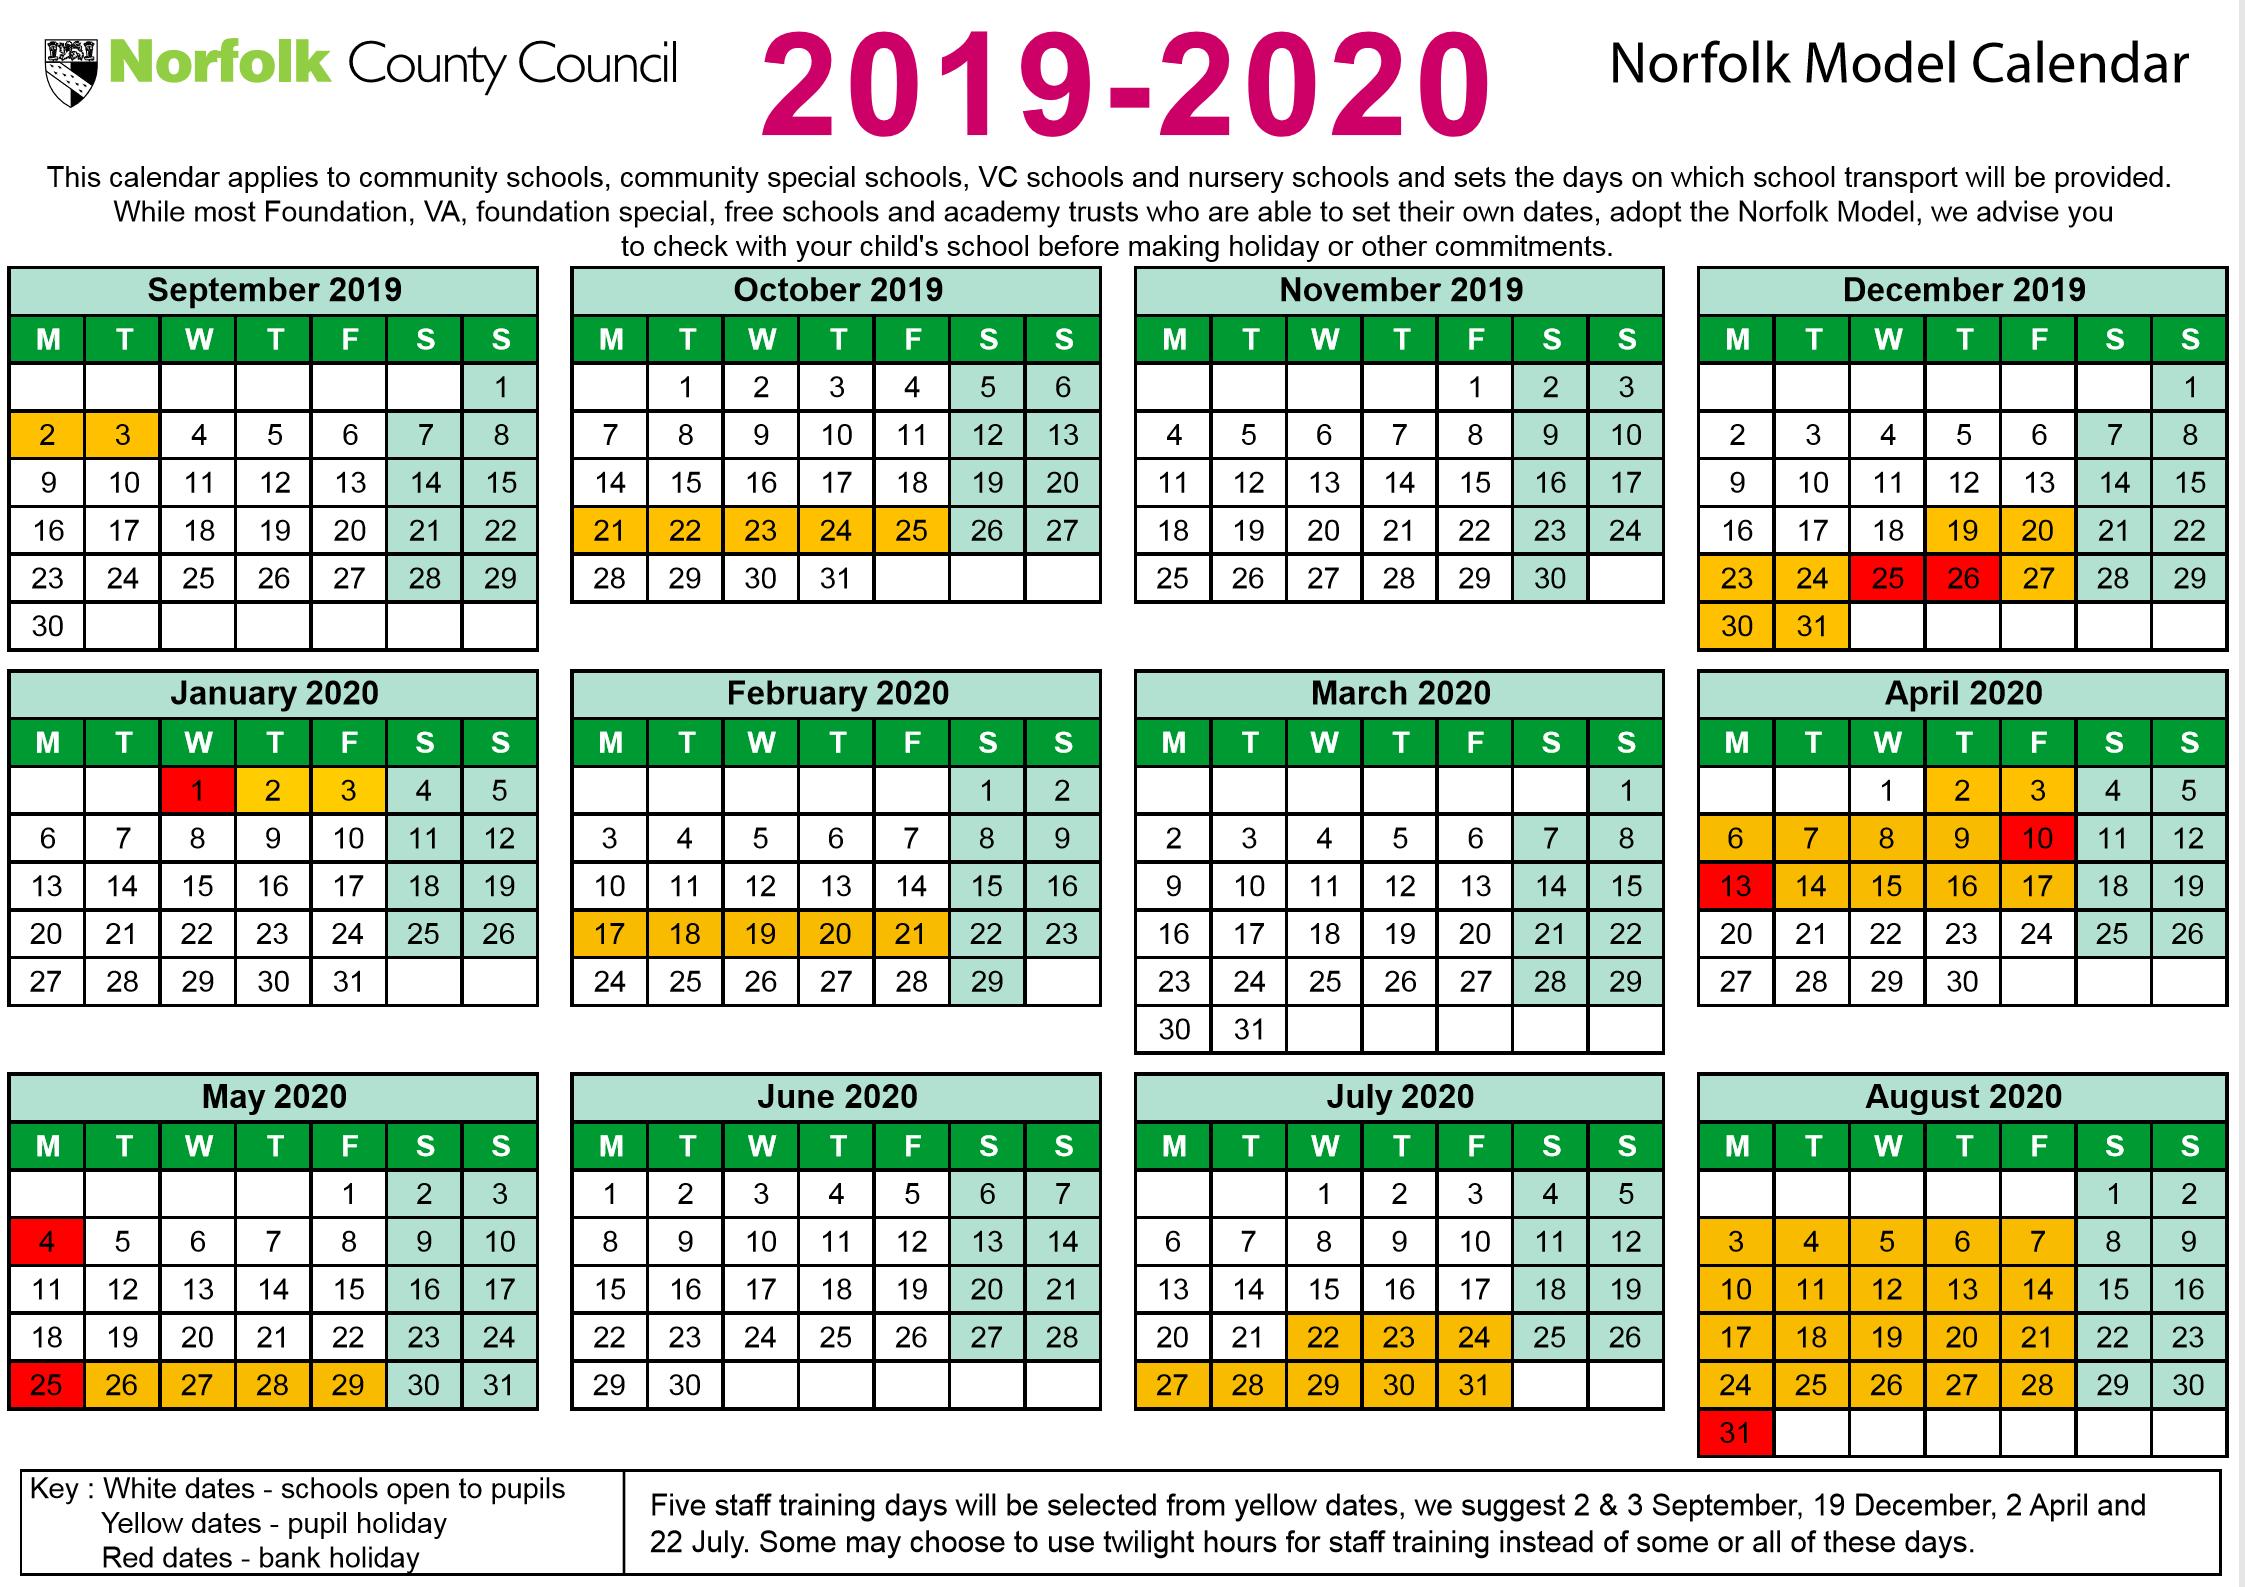 Norfolk Schools Timetable, 2019-2020